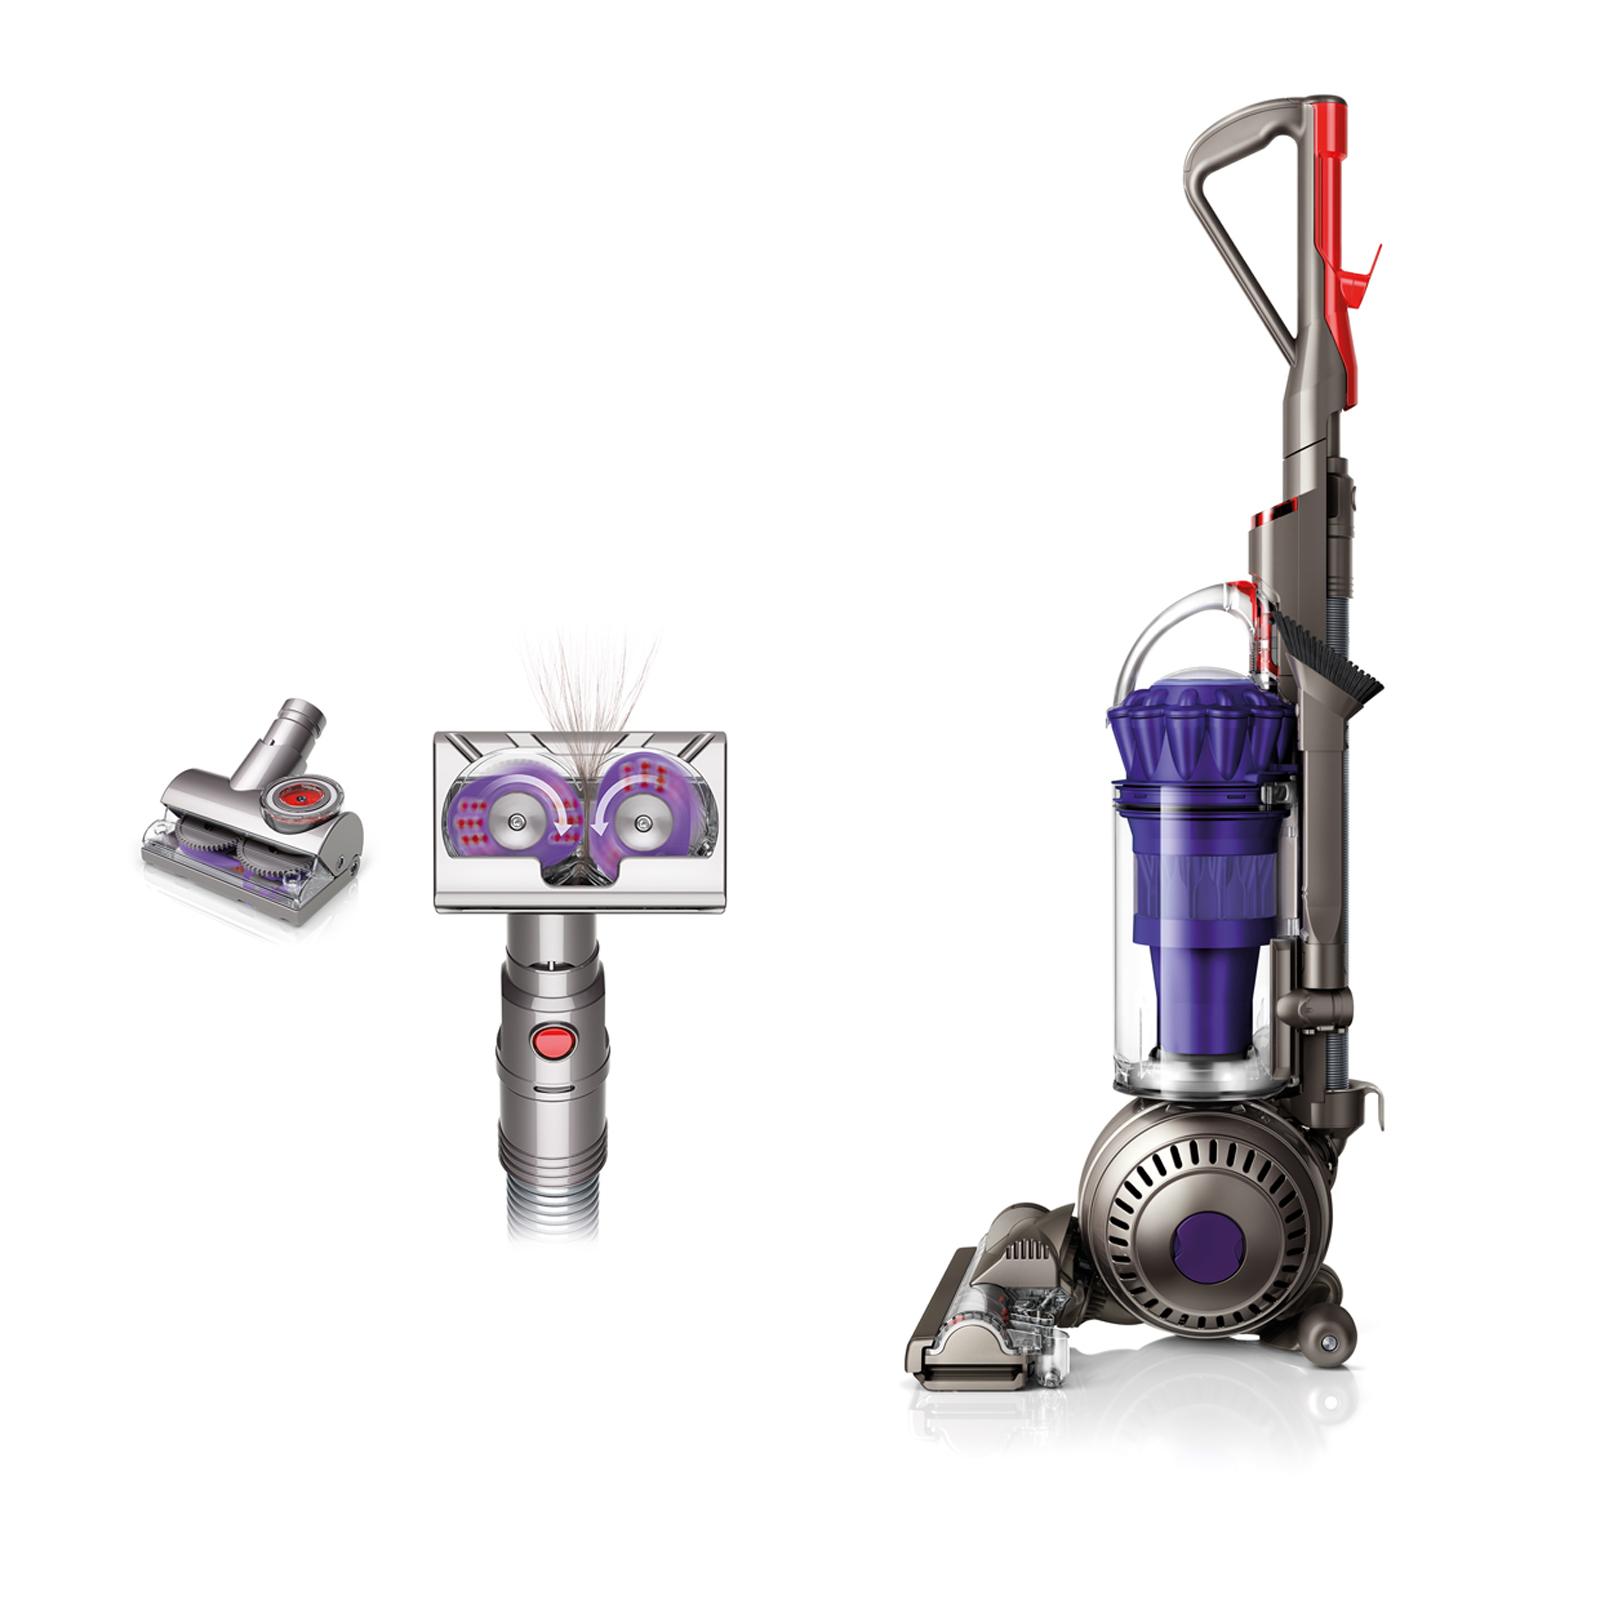 Dyson DC41 Animal Upright Vacuum